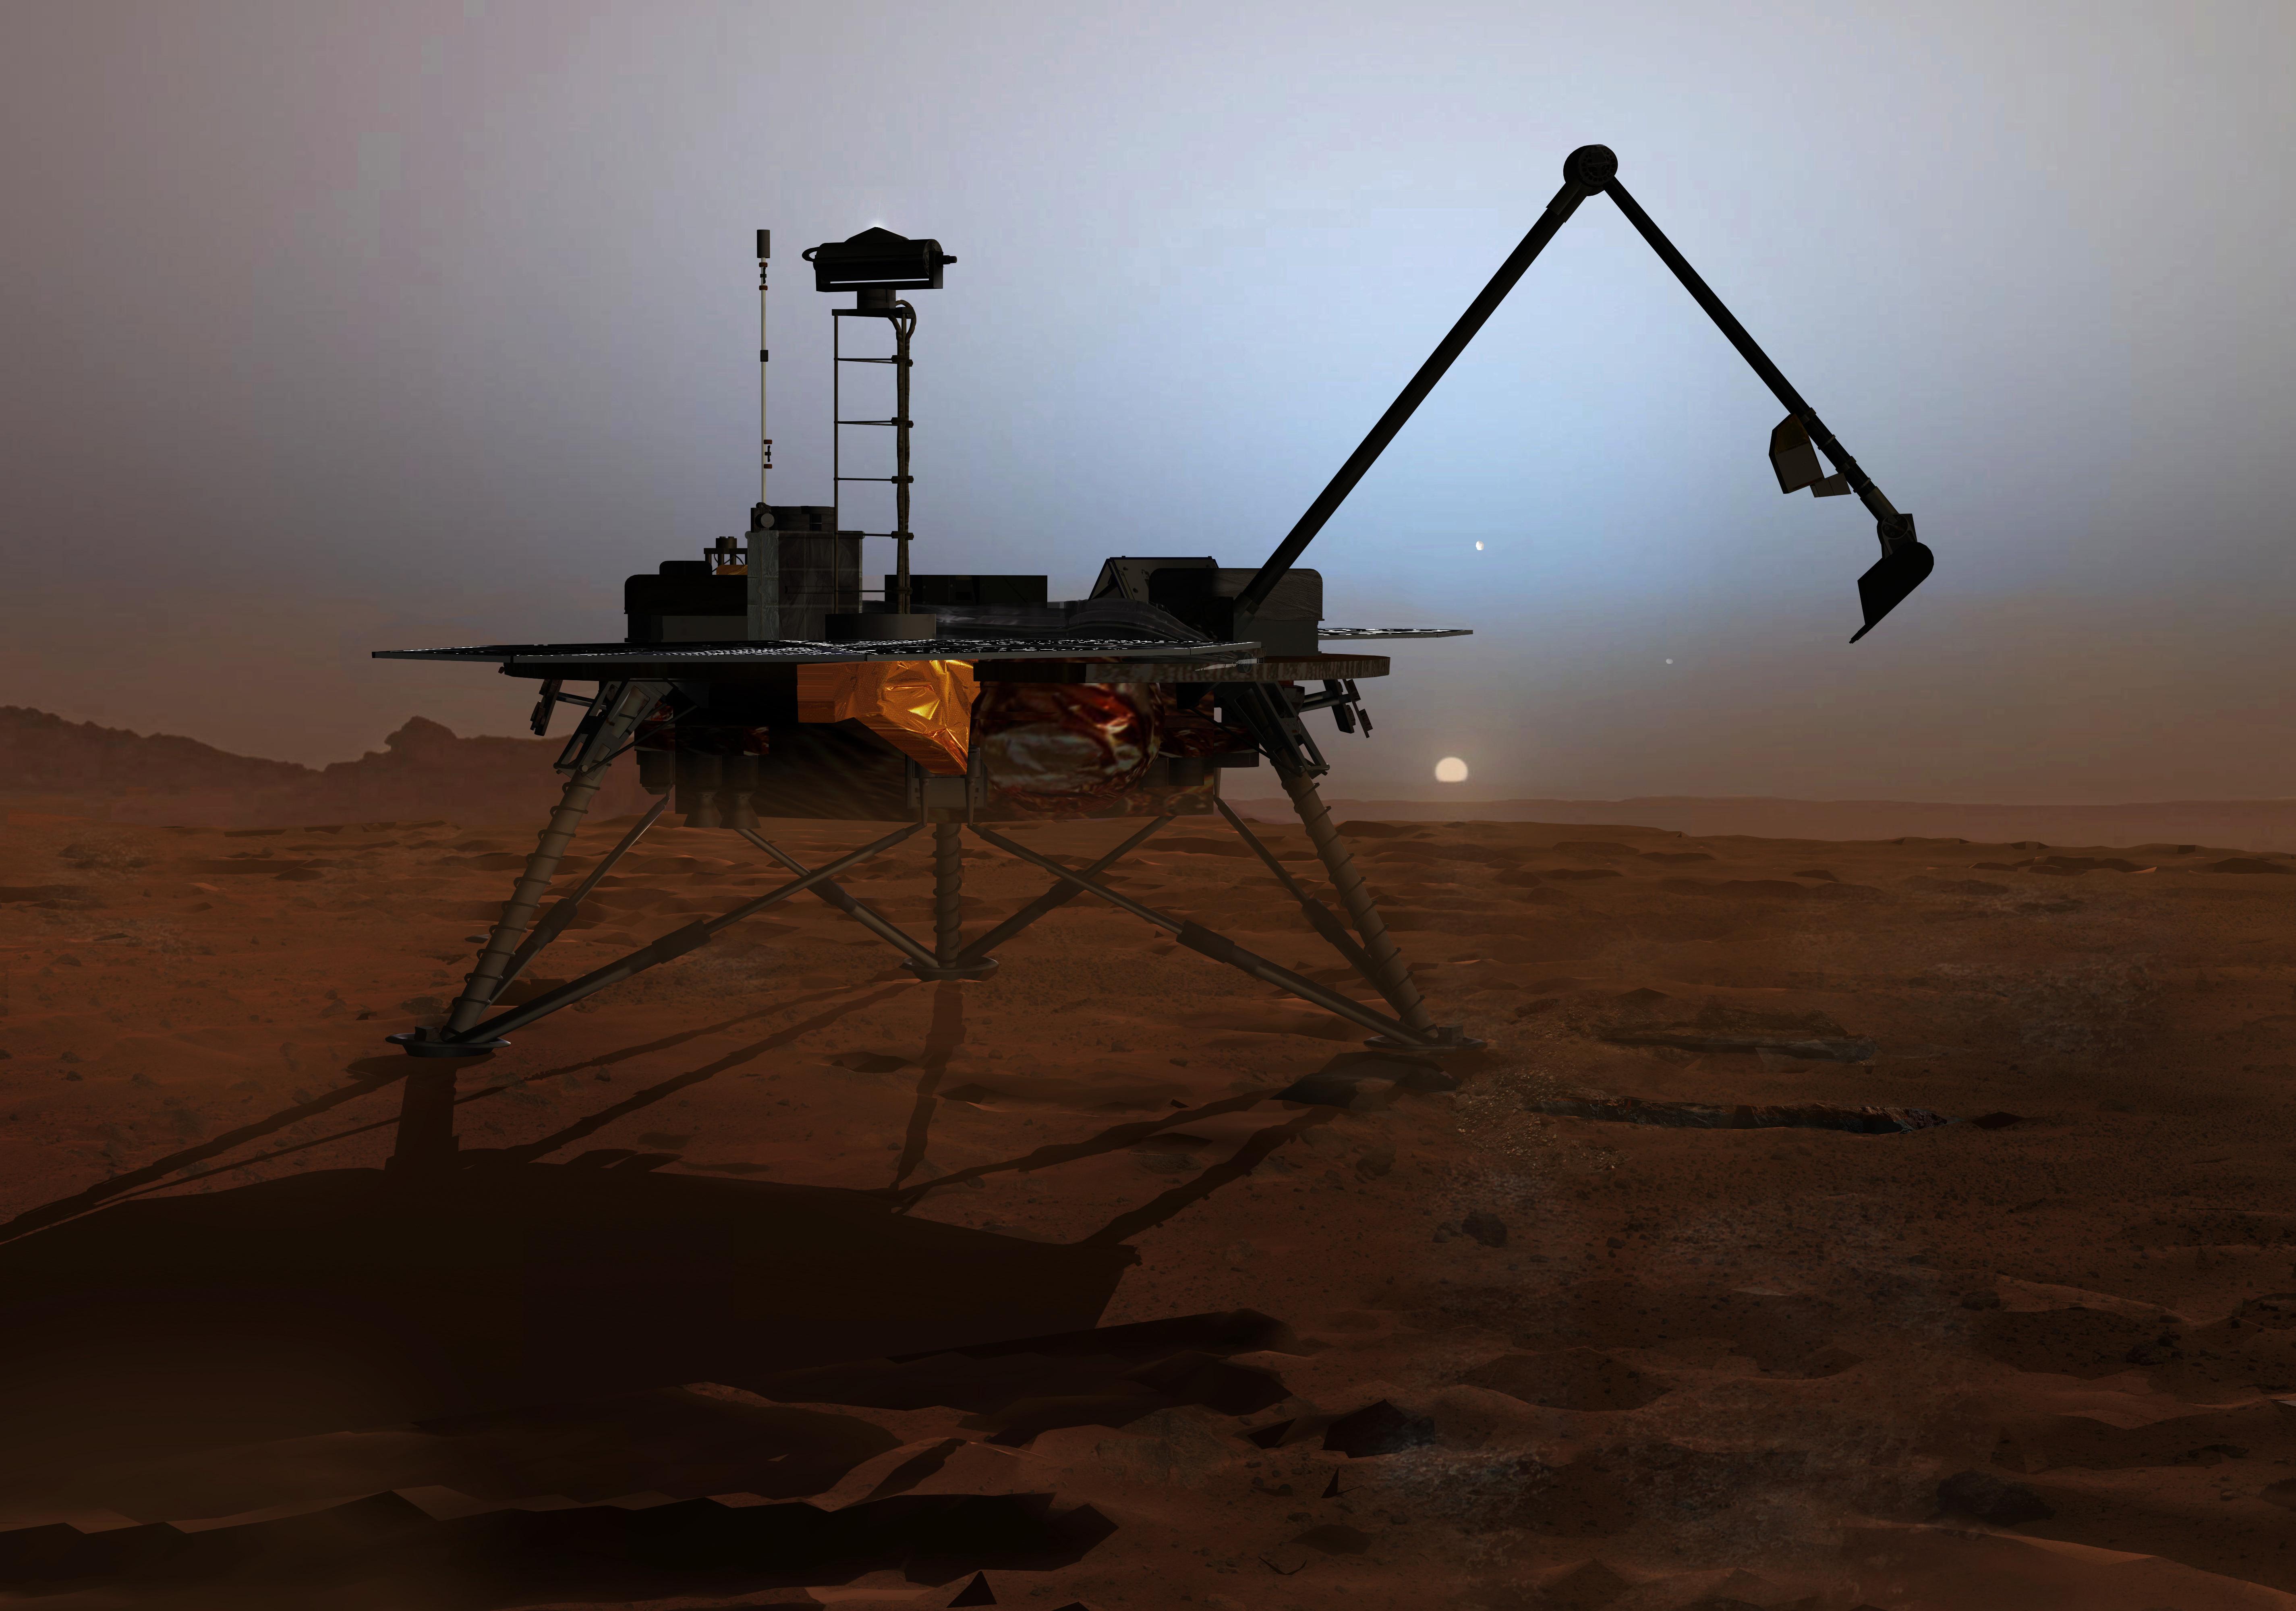 phoenix mission to mars - photo #8